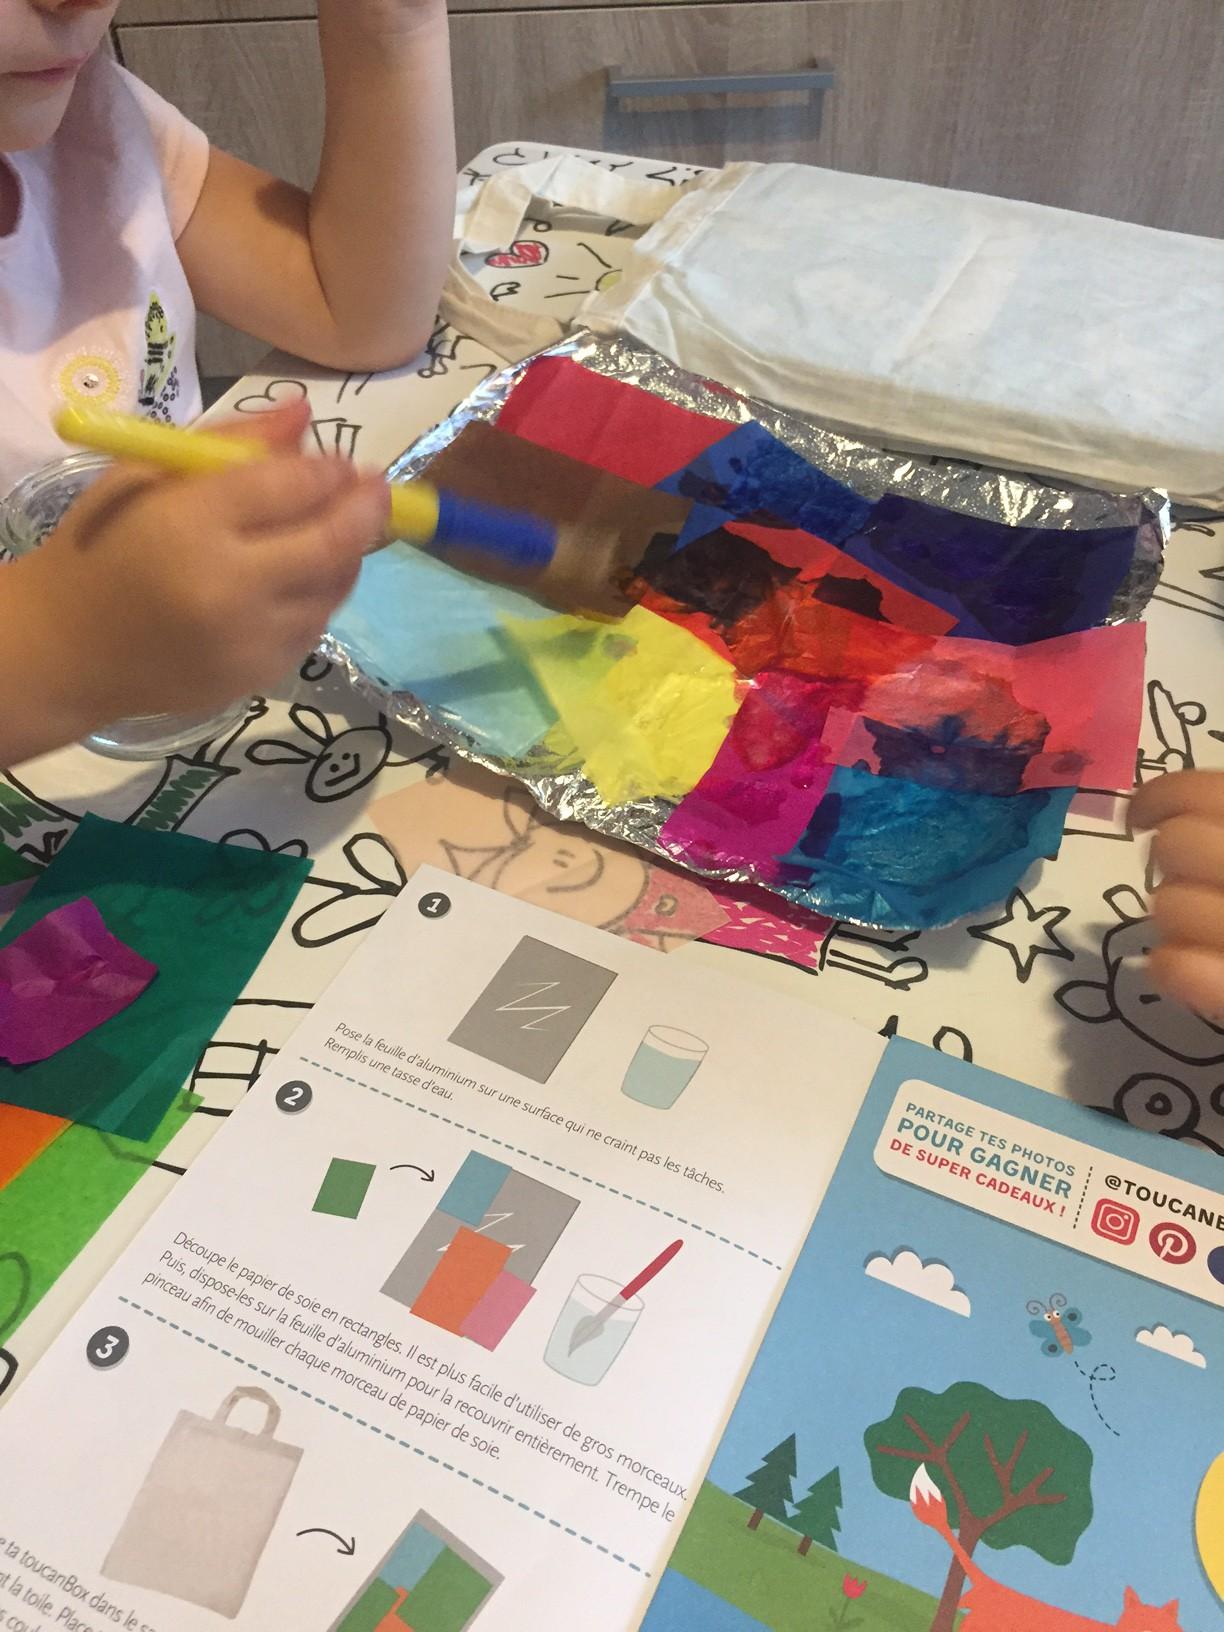 toucan box creative enfant